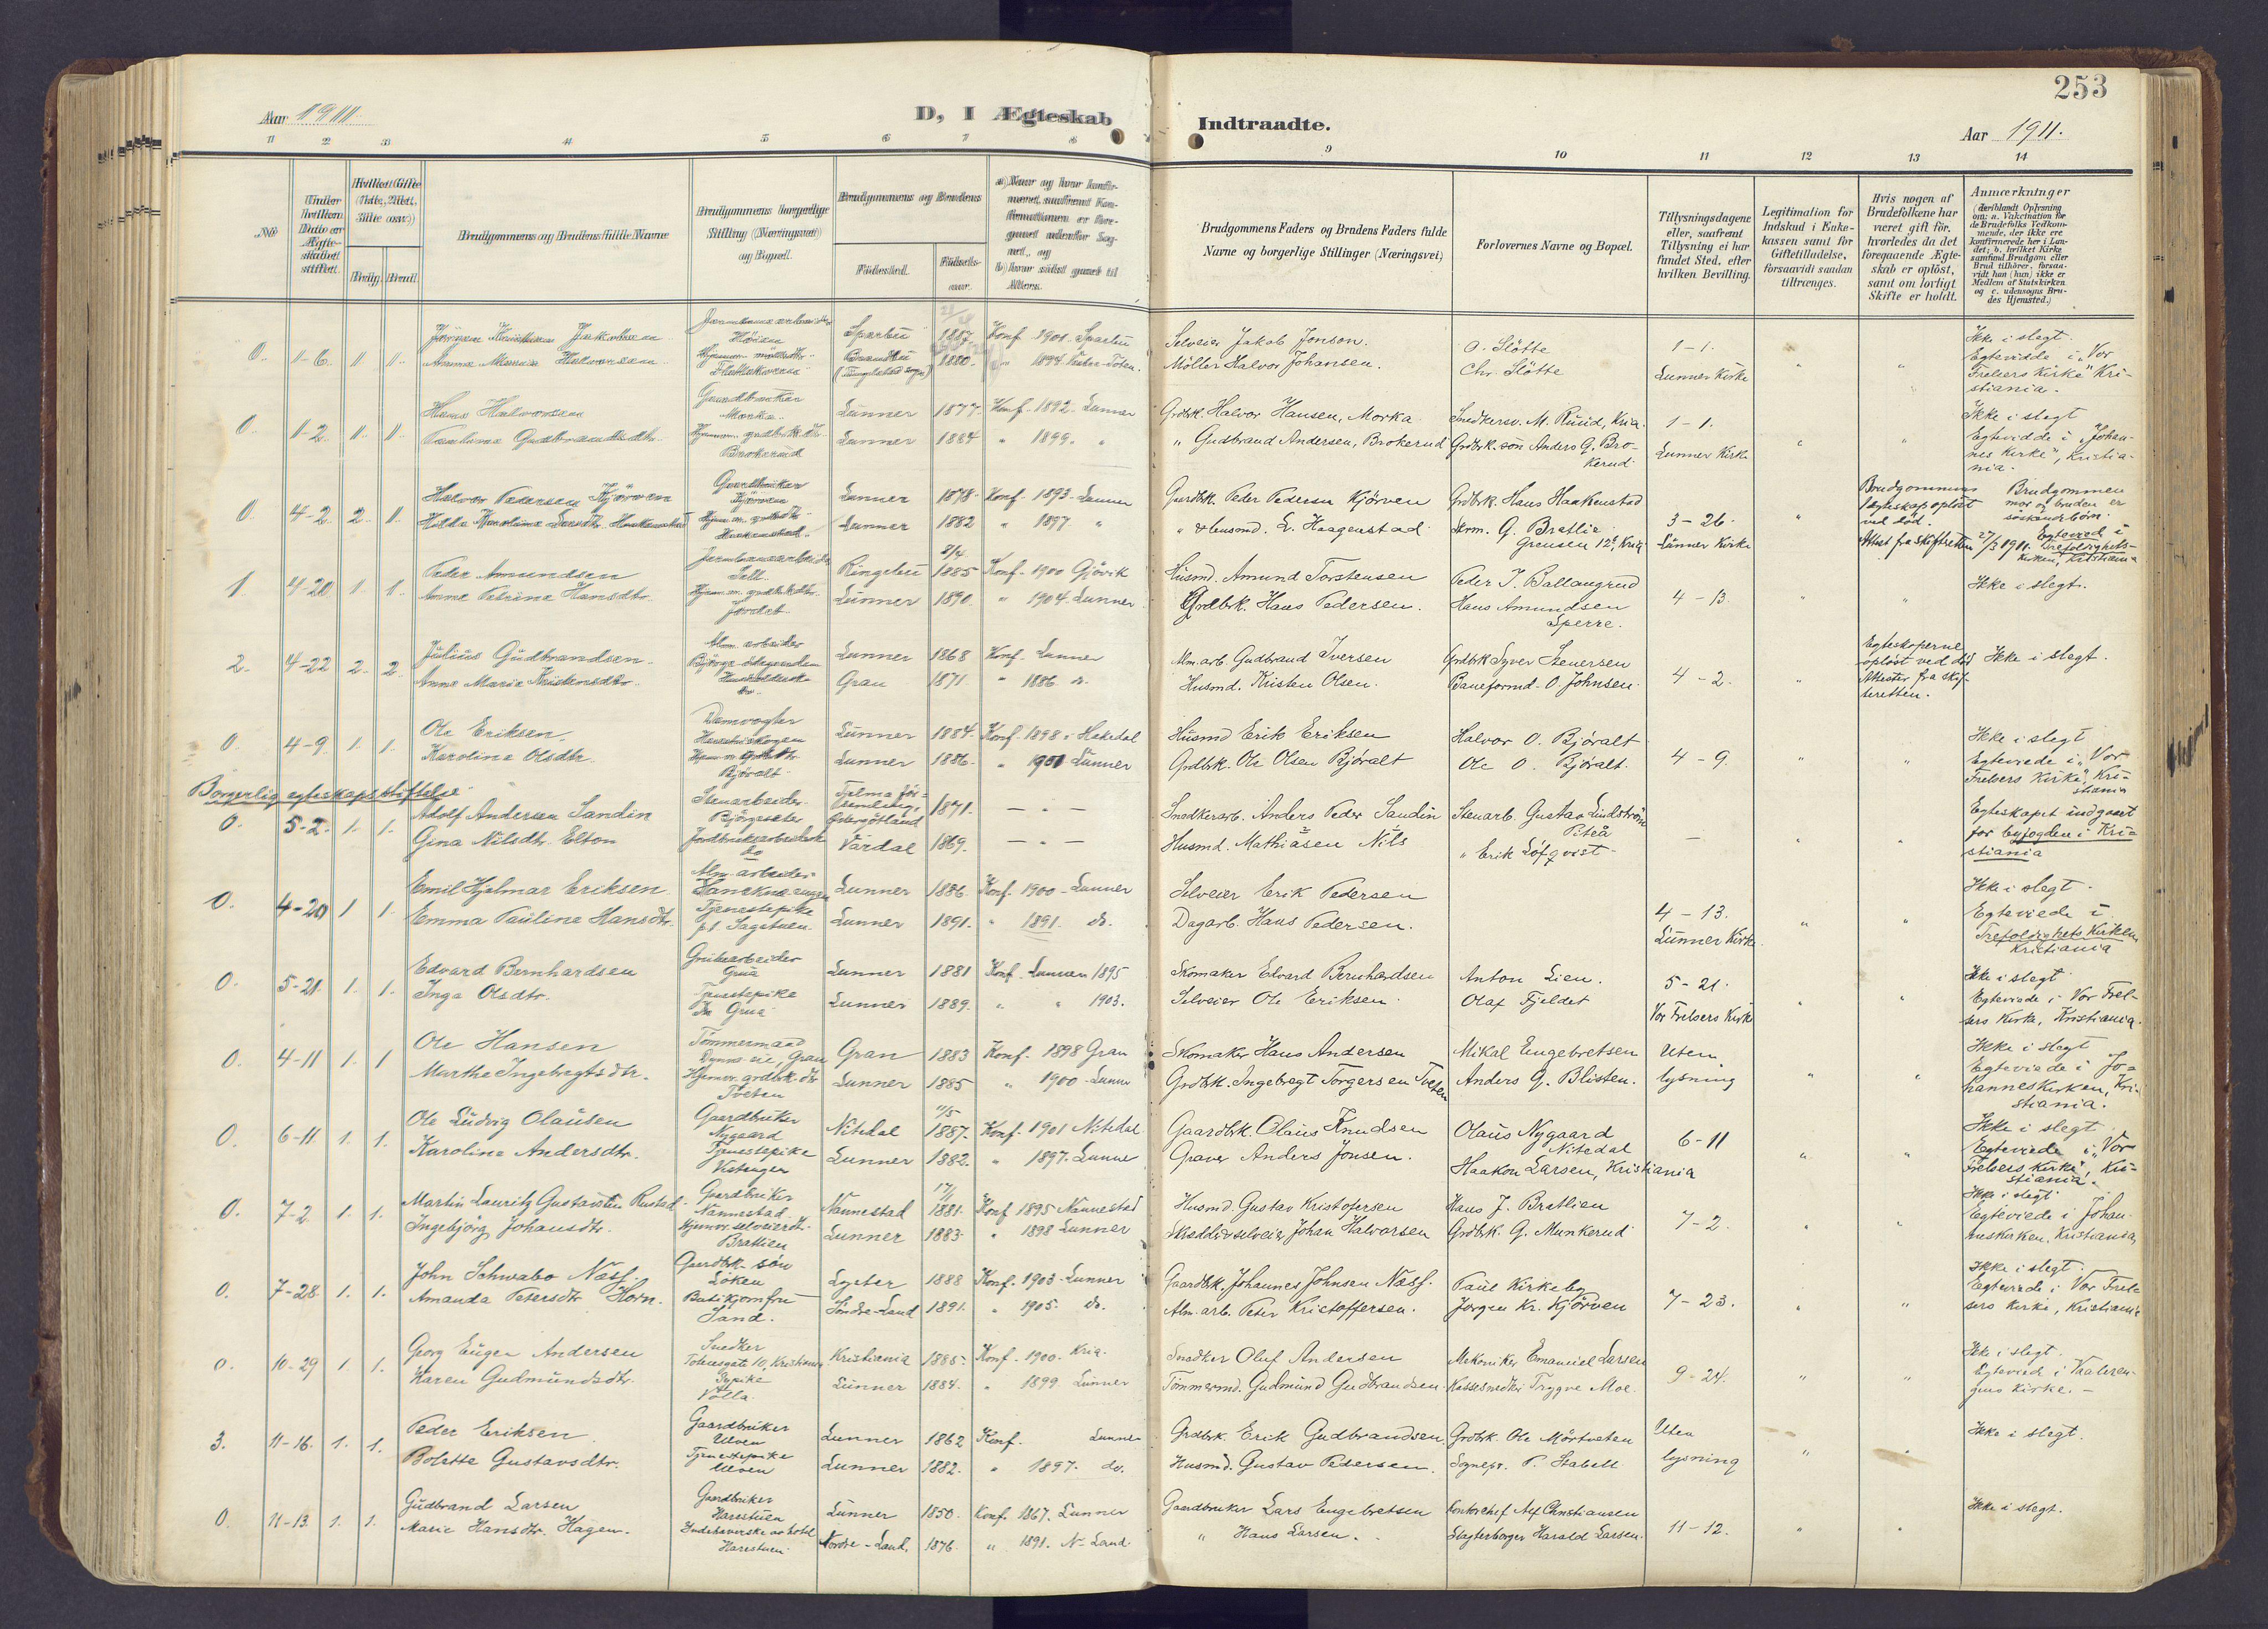 SAH, Lunner prestekontor, H/Ha/Haa/L0001: Ministerialbok nr. 1, 1907-1922, s. 253